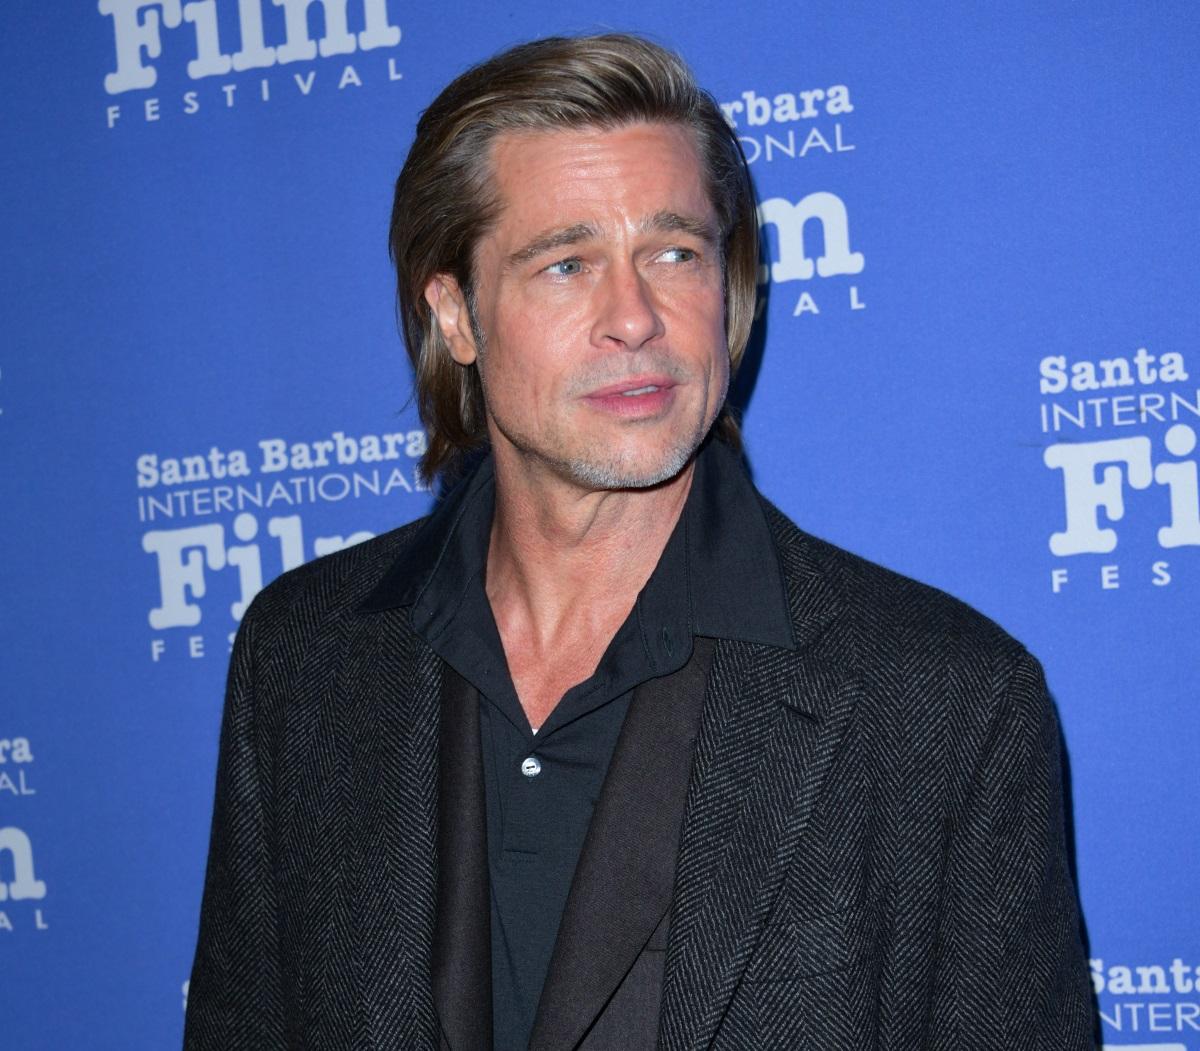 BAFTA 2020: Τα καυστικά σχόλια του Brad Pitt στον ευχαριστήριο λόγο του! Πώς σχολίασε Brexit και… Megxit [vid]